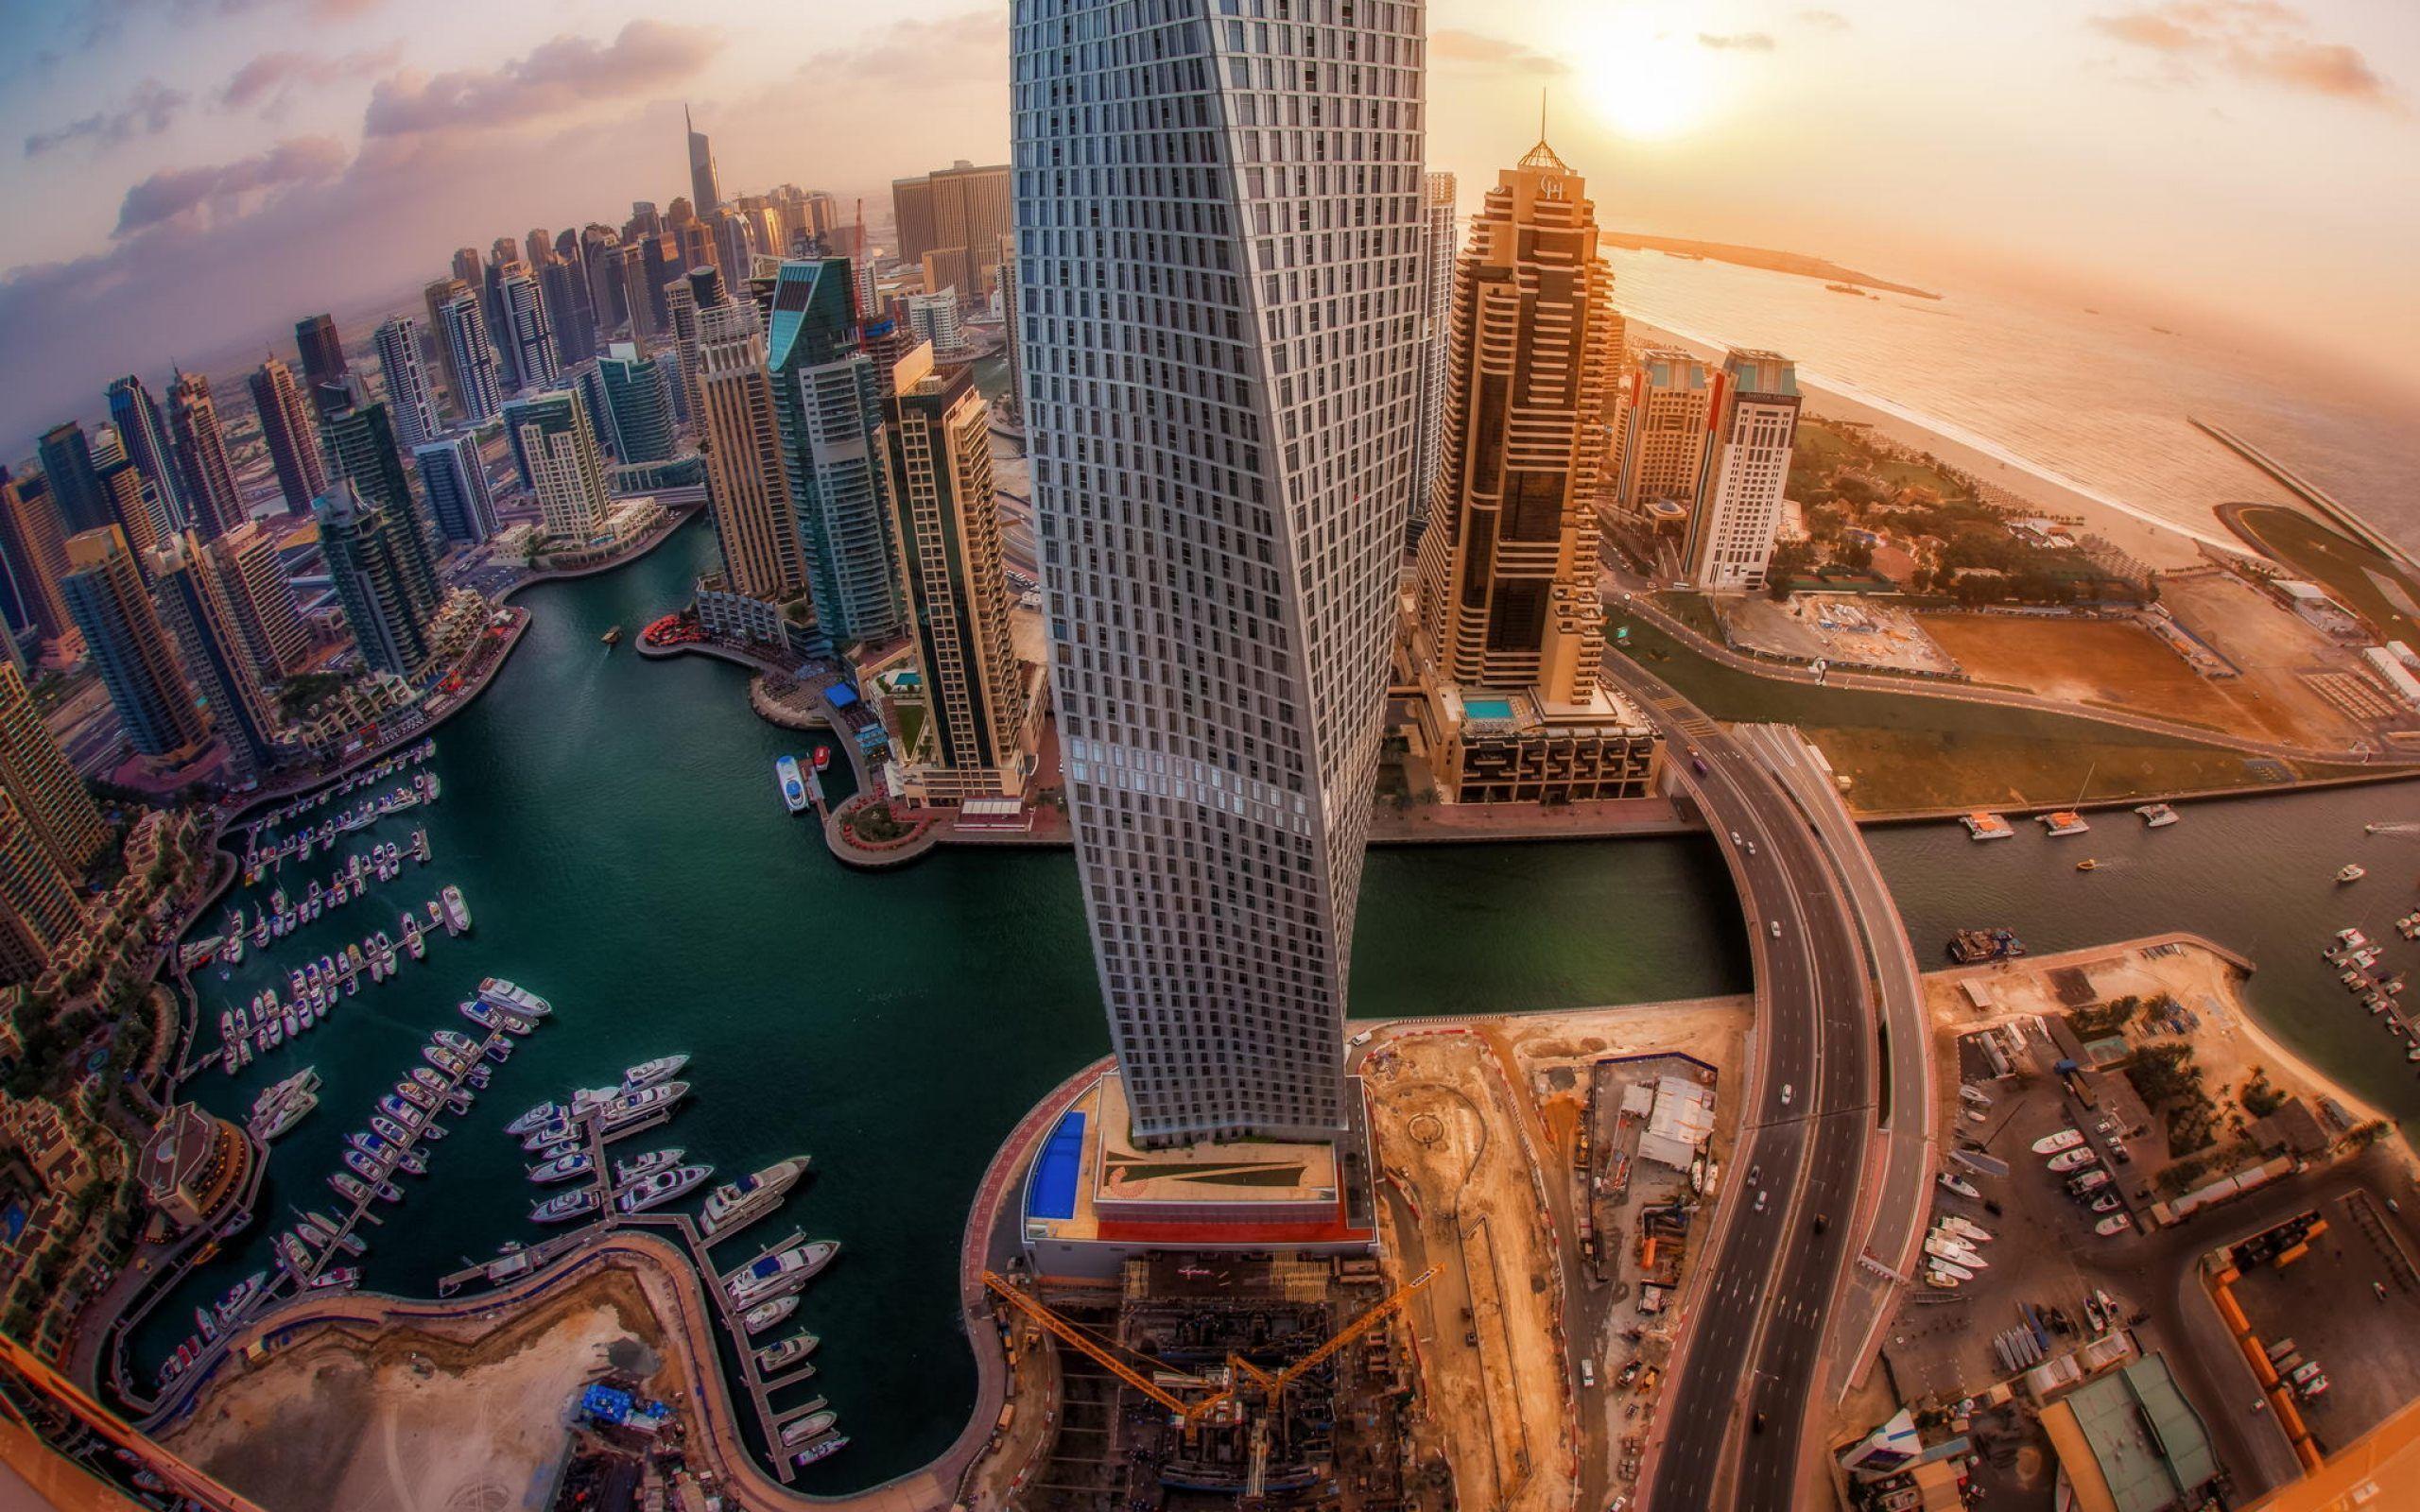 30 Beautiful Dubai Wallpapers Widescreen High rise buildings, dubai, sea, beach, skyscrapers, night, architecture. 30 beautiful dubai wallpapers widescreen